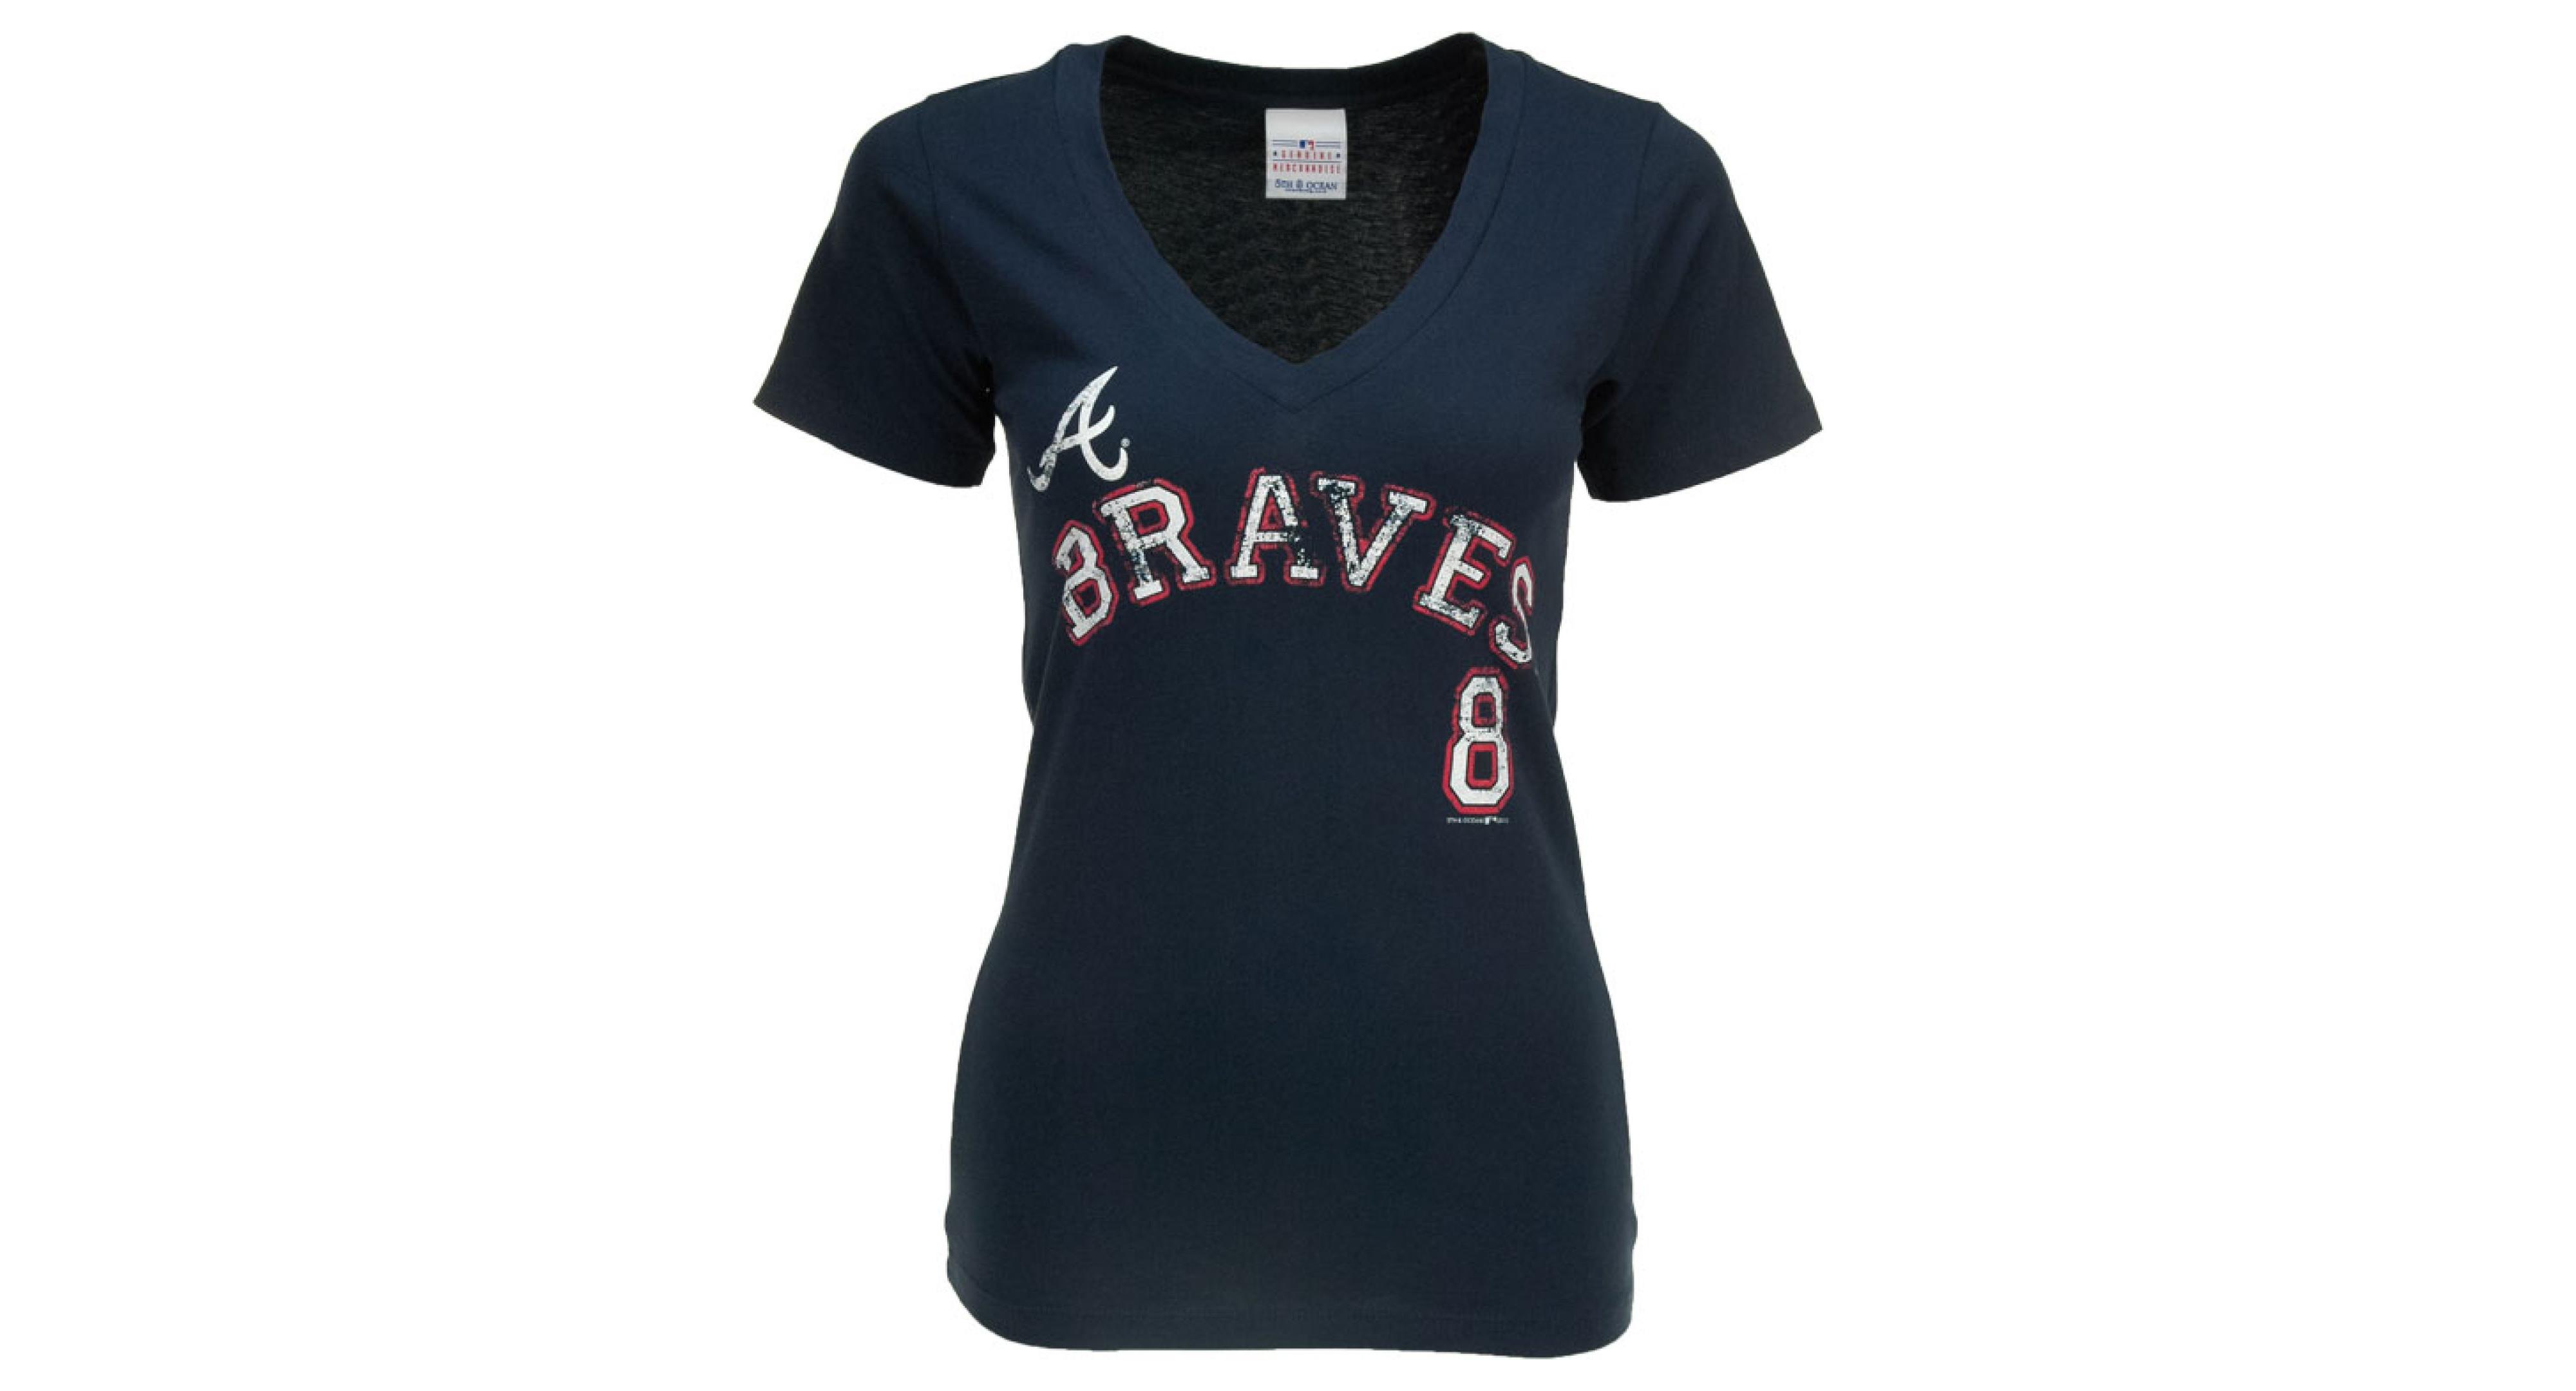 5th Ocean Women S Atlanta Braves Justin Upton Sugar Player T Shirt Atlanta Braves Women Shirts